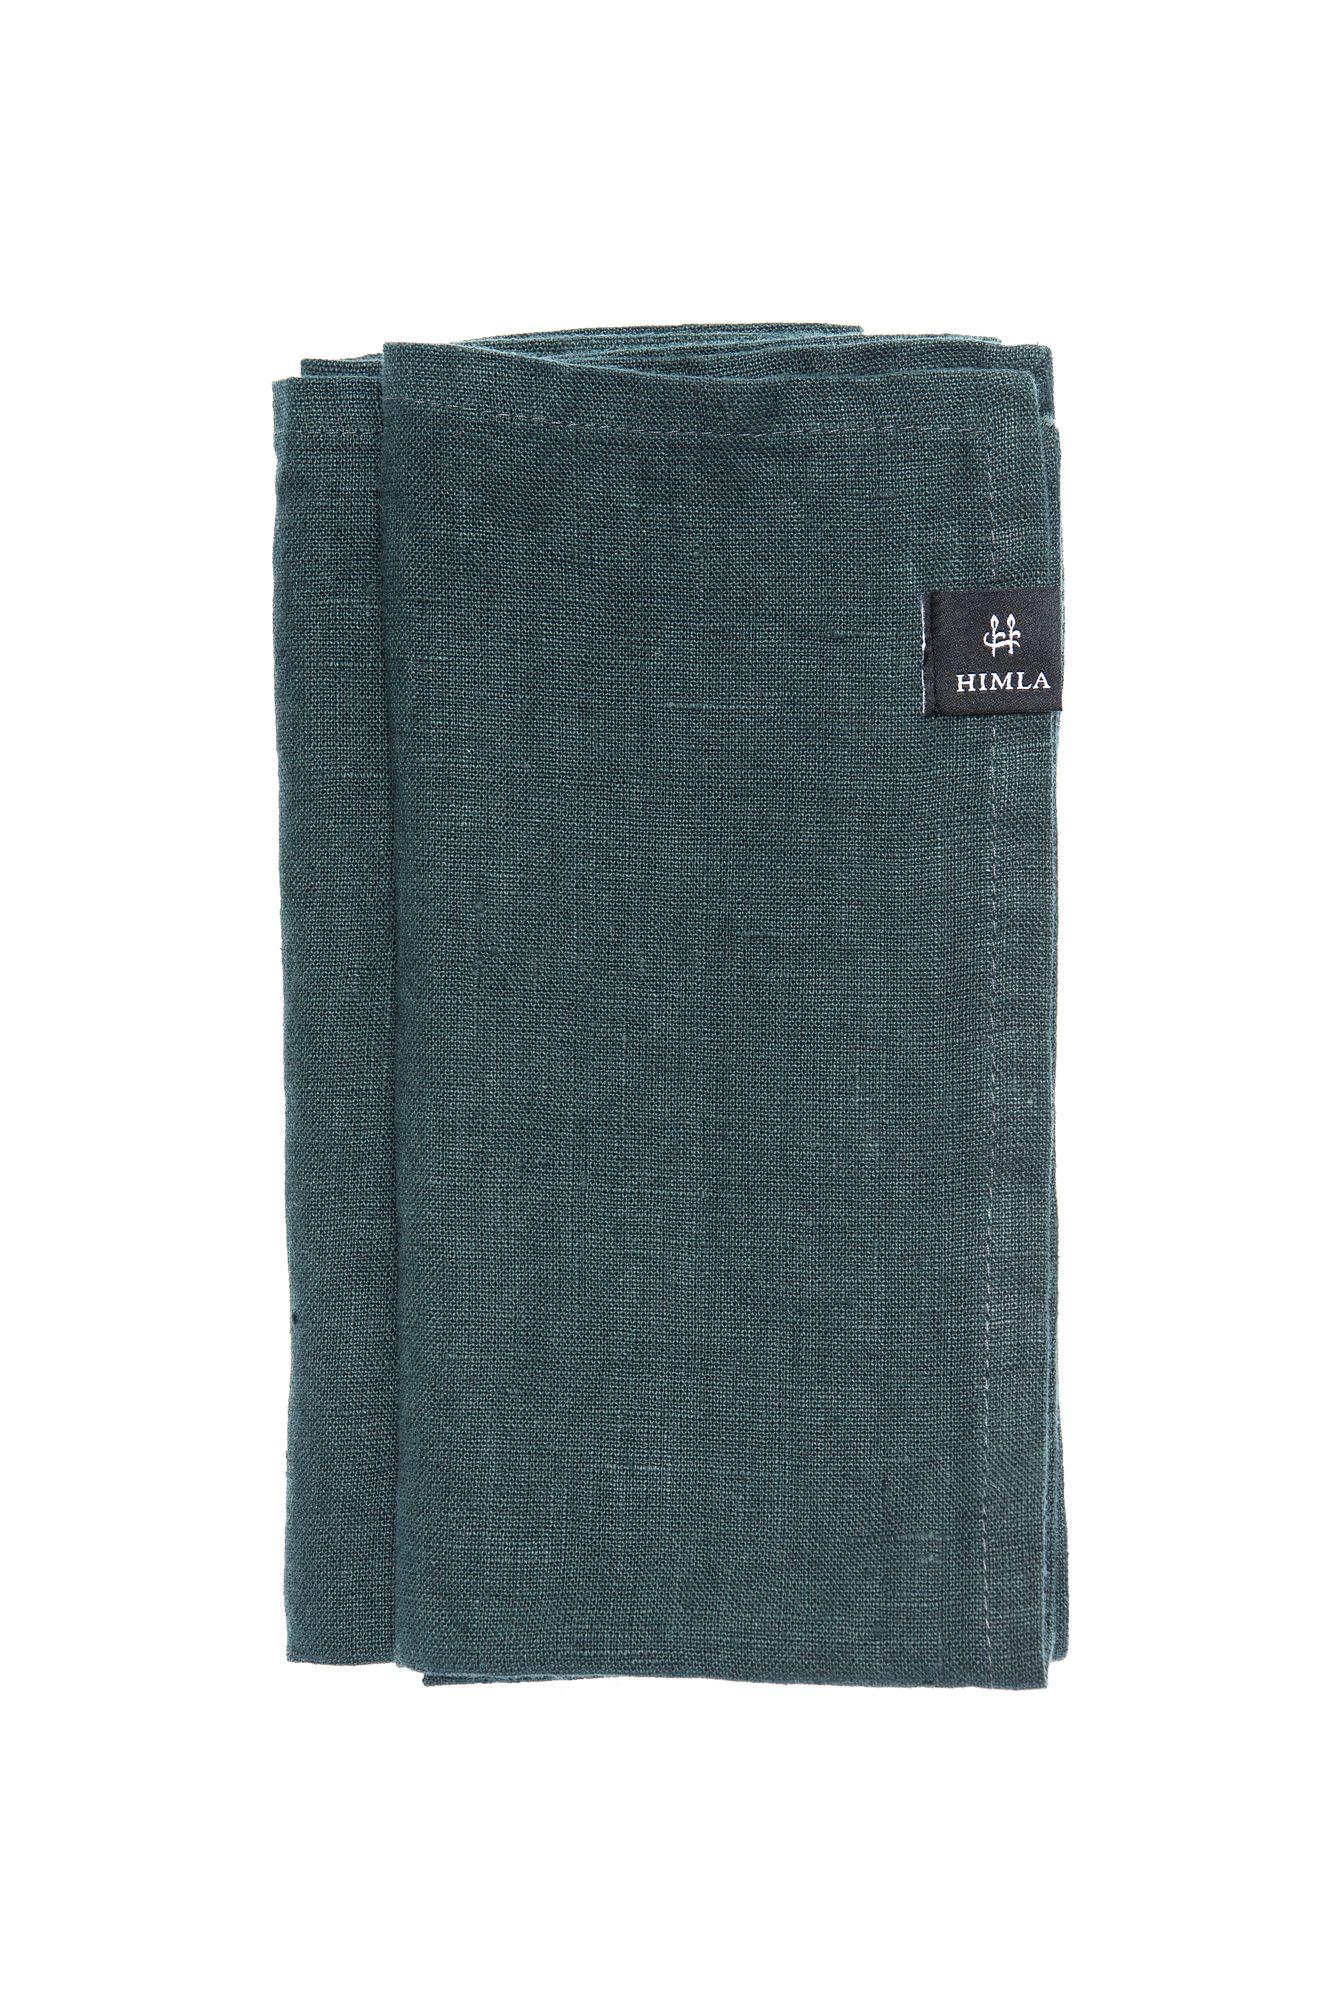 HIMLA Sunshine lin serviett 45x45cm, Mystique